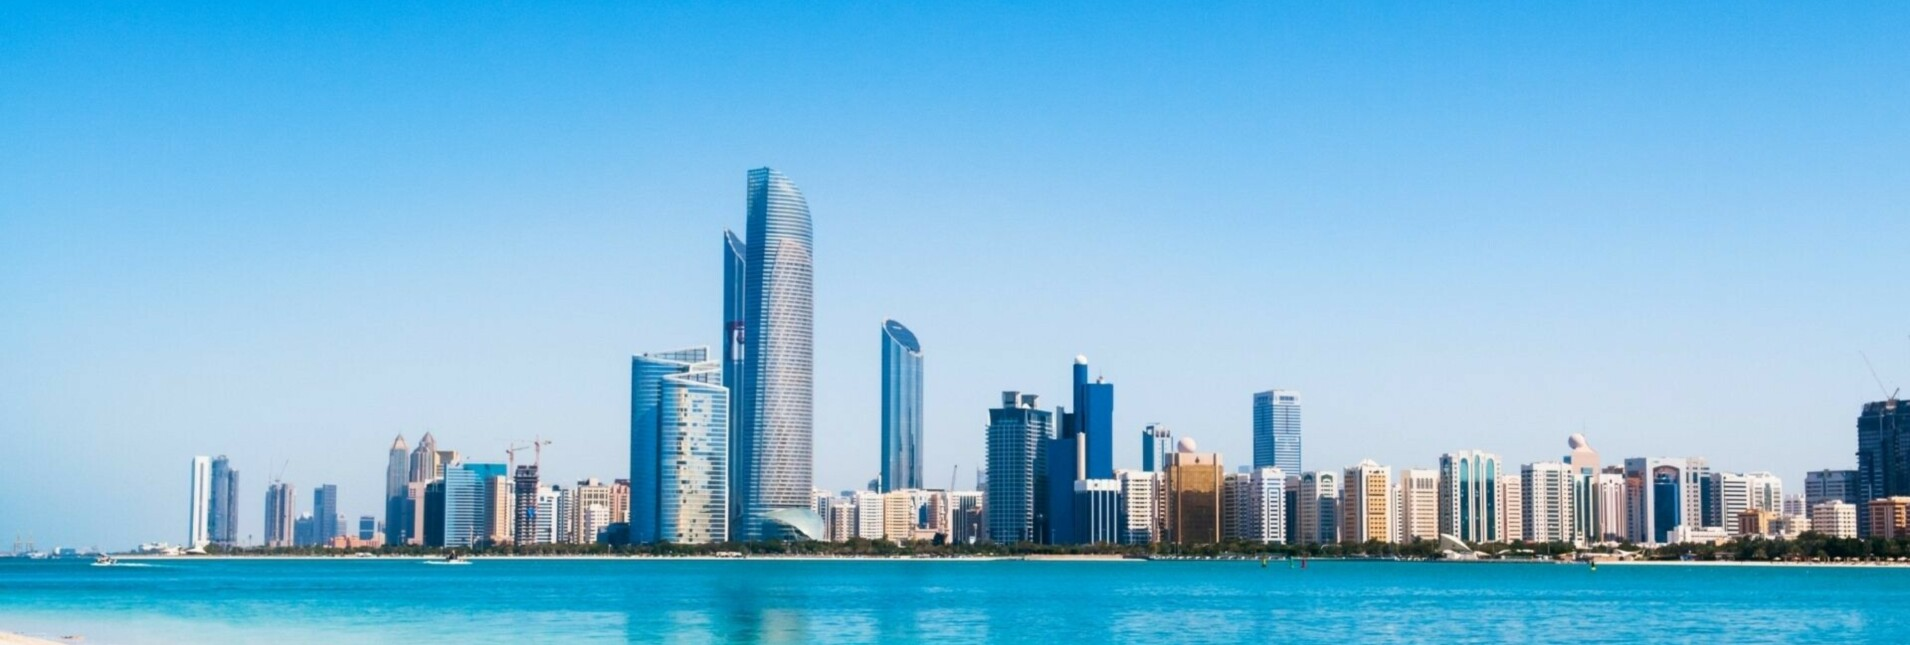 Mein Schiff 6 - Dubai mit Katar I